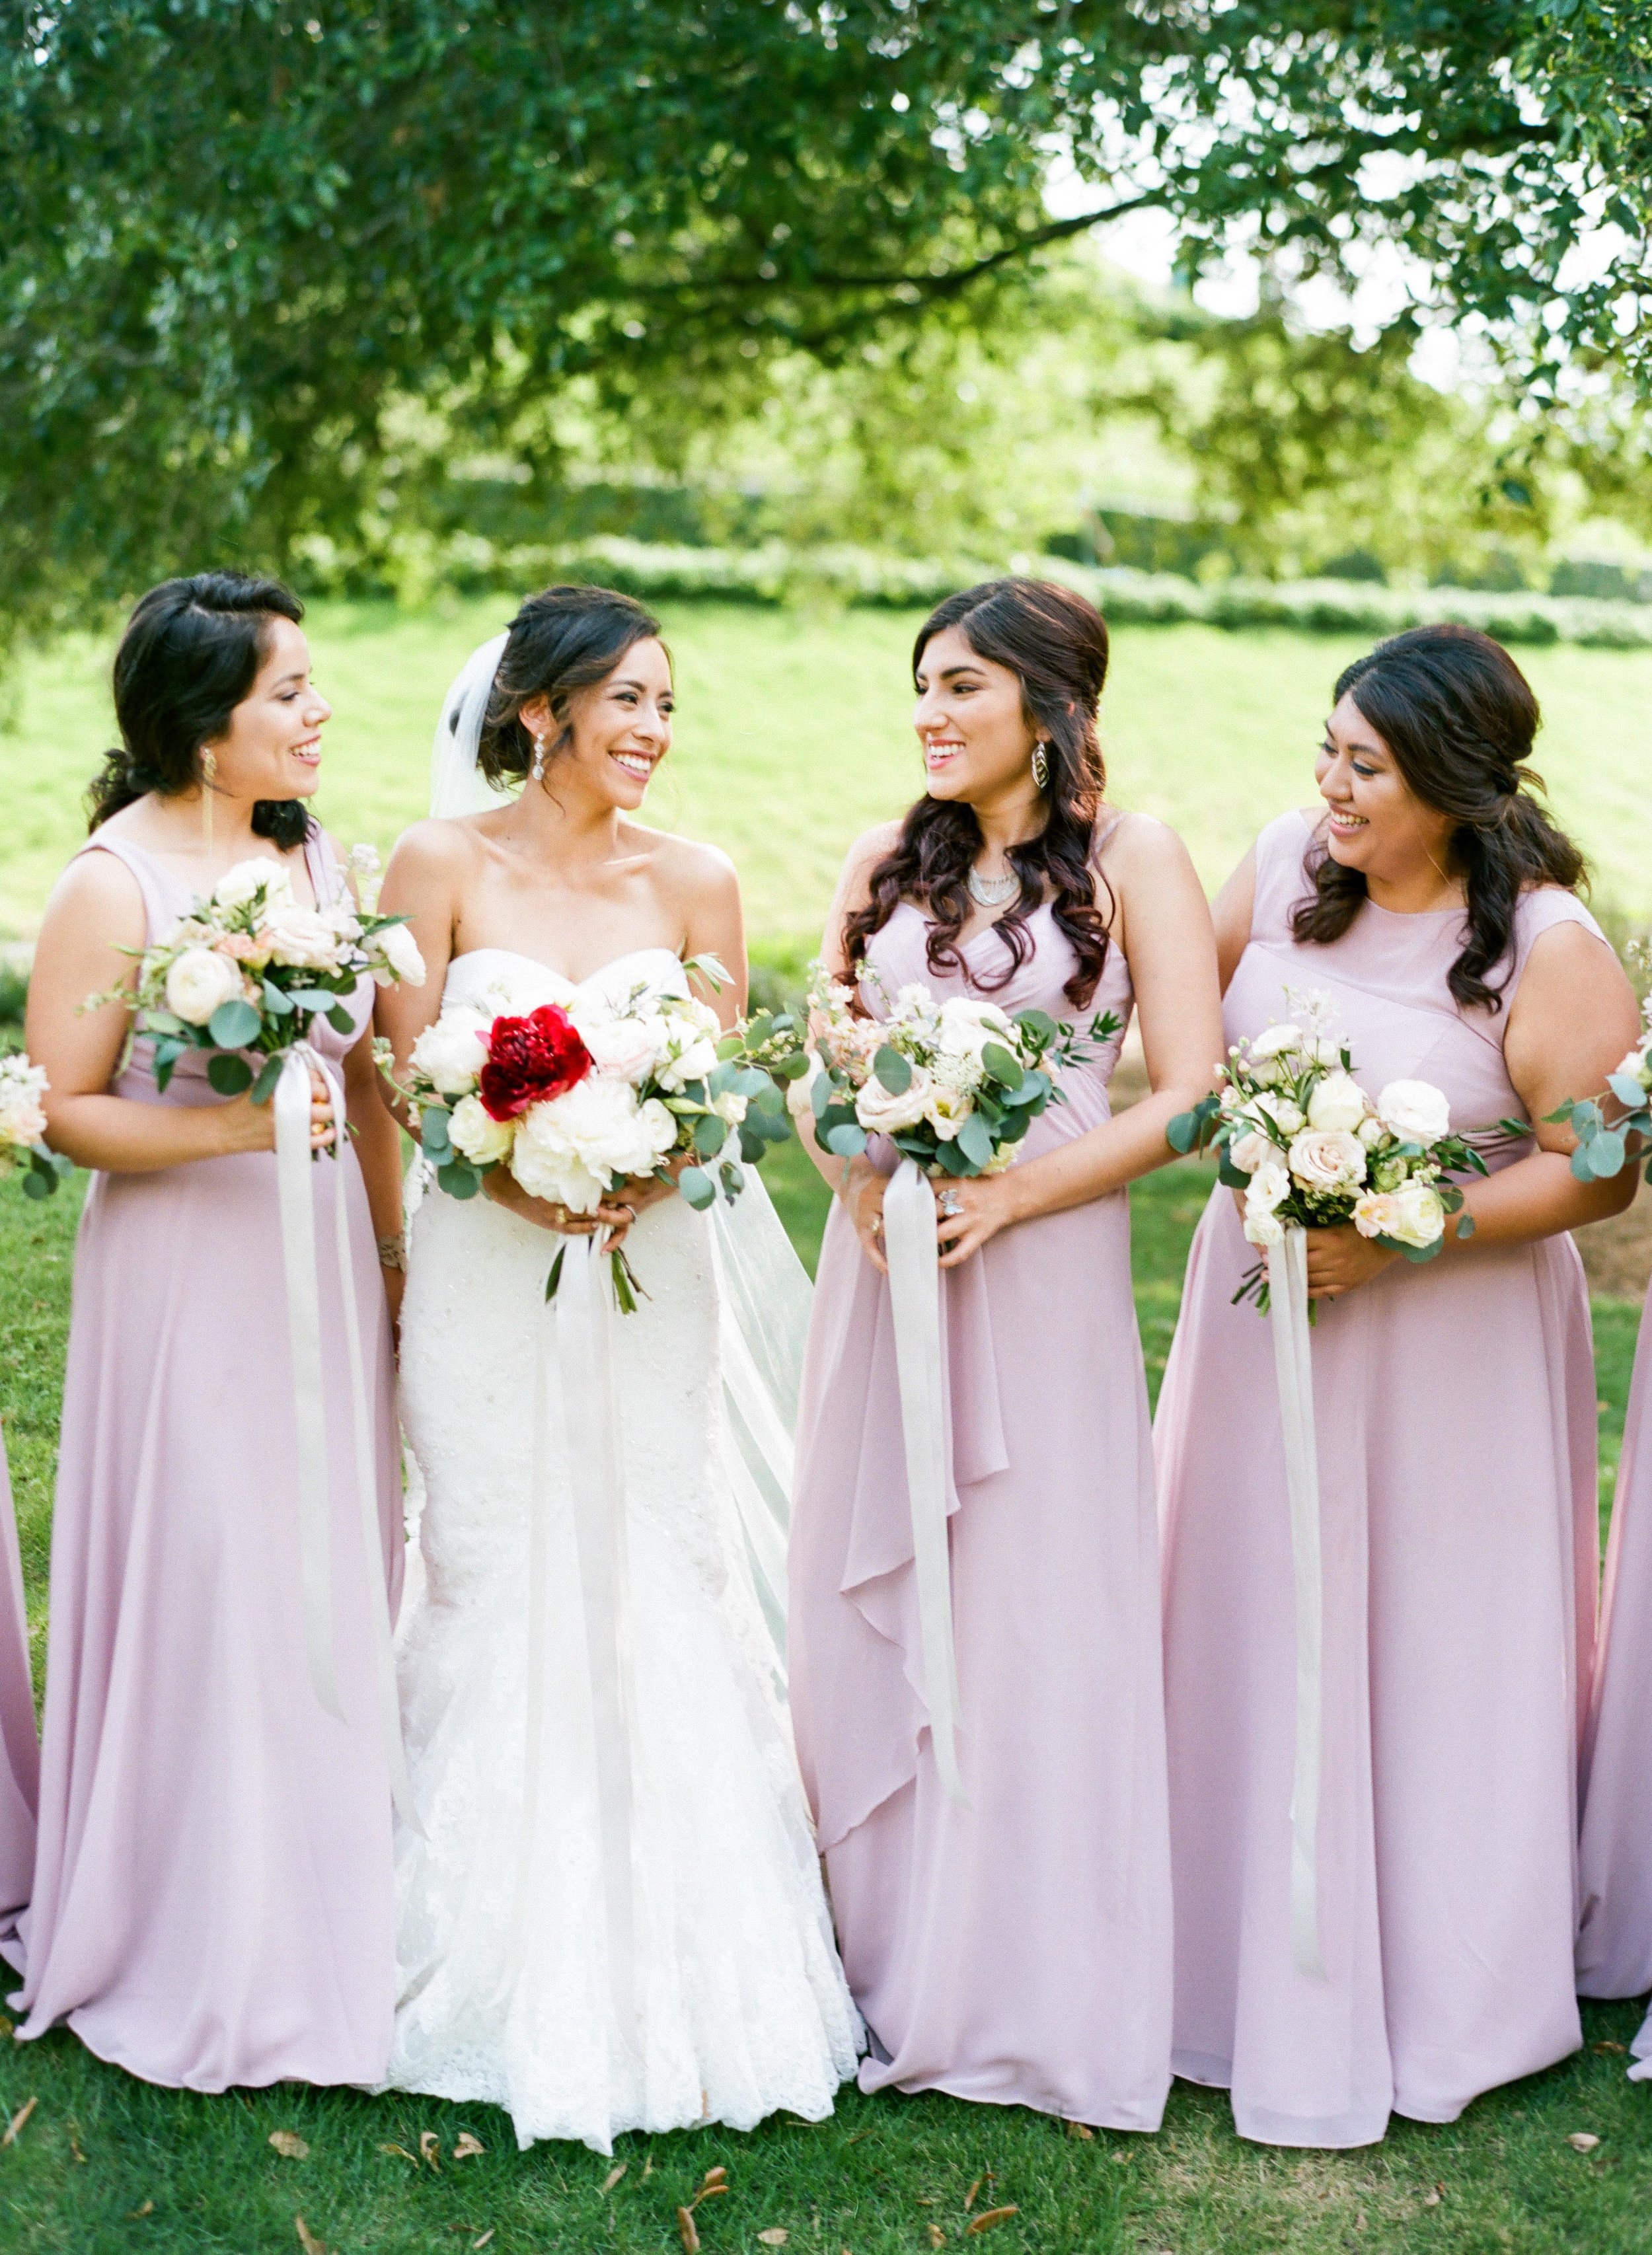 Houston-Wedding-Photography-St.-Anne-Catholic-Church-Houston-Wedding-The-Bell-Tower-on-34th-reception-wedding-film-16.jpg